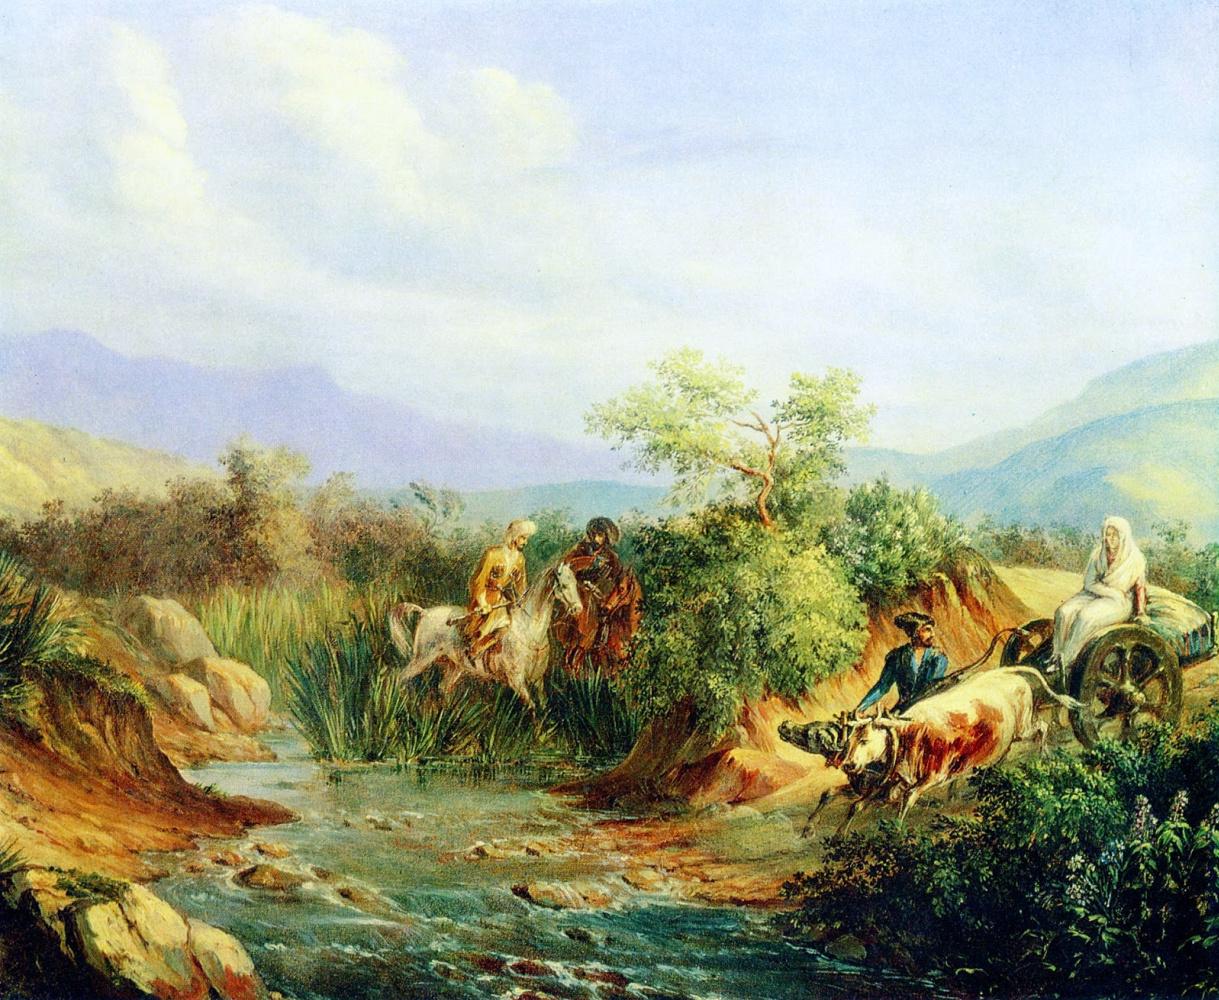 Mikhail Yurjevich Lermontov. A scene from the Caucasian life.